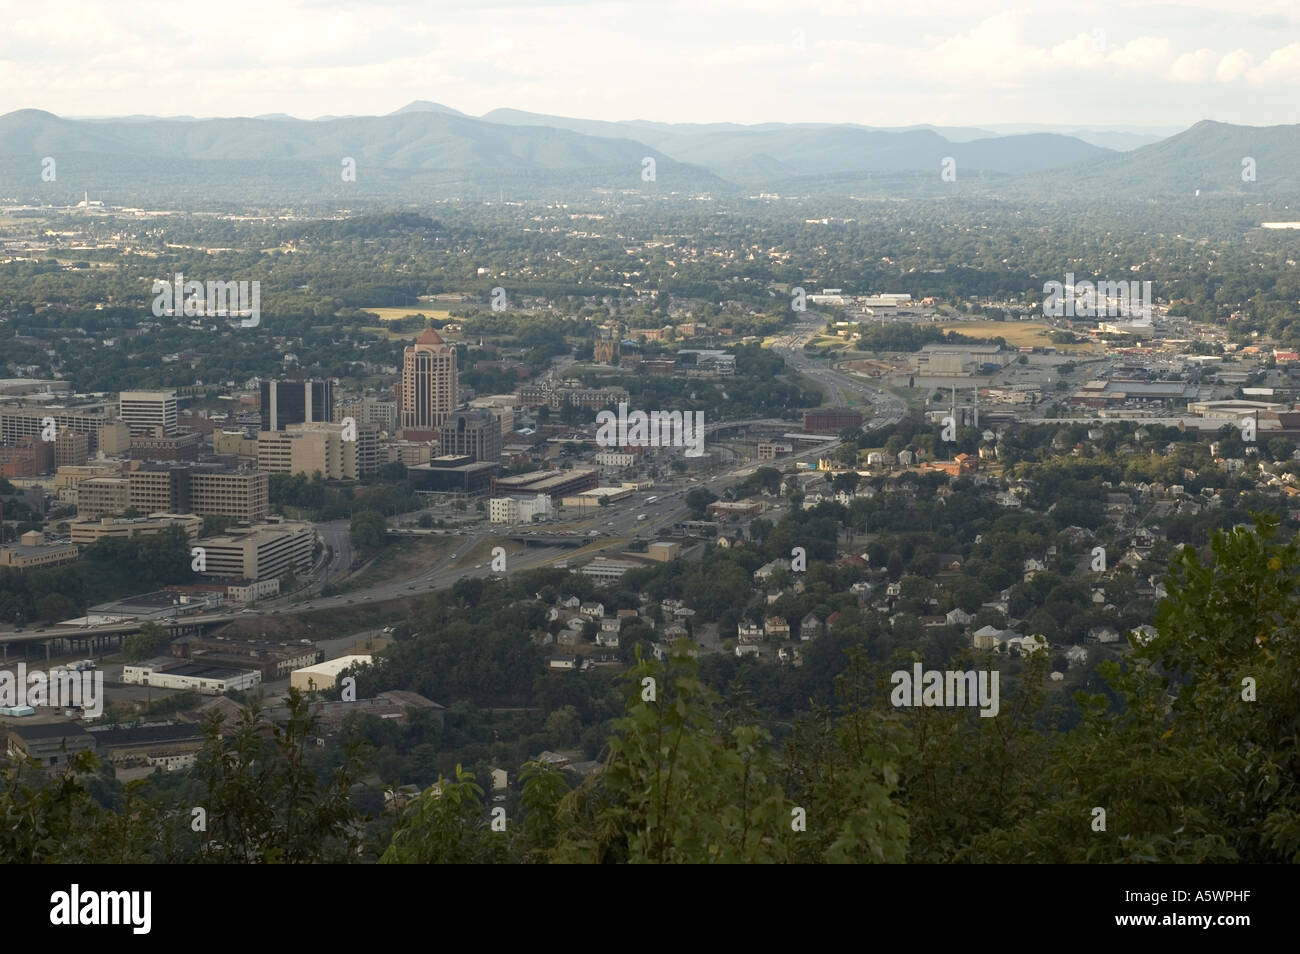 Landscape overlooking the City of Roanoke, Virginia - Landscape Overlooking The City Of Roanoke, Virginia Stock Photo